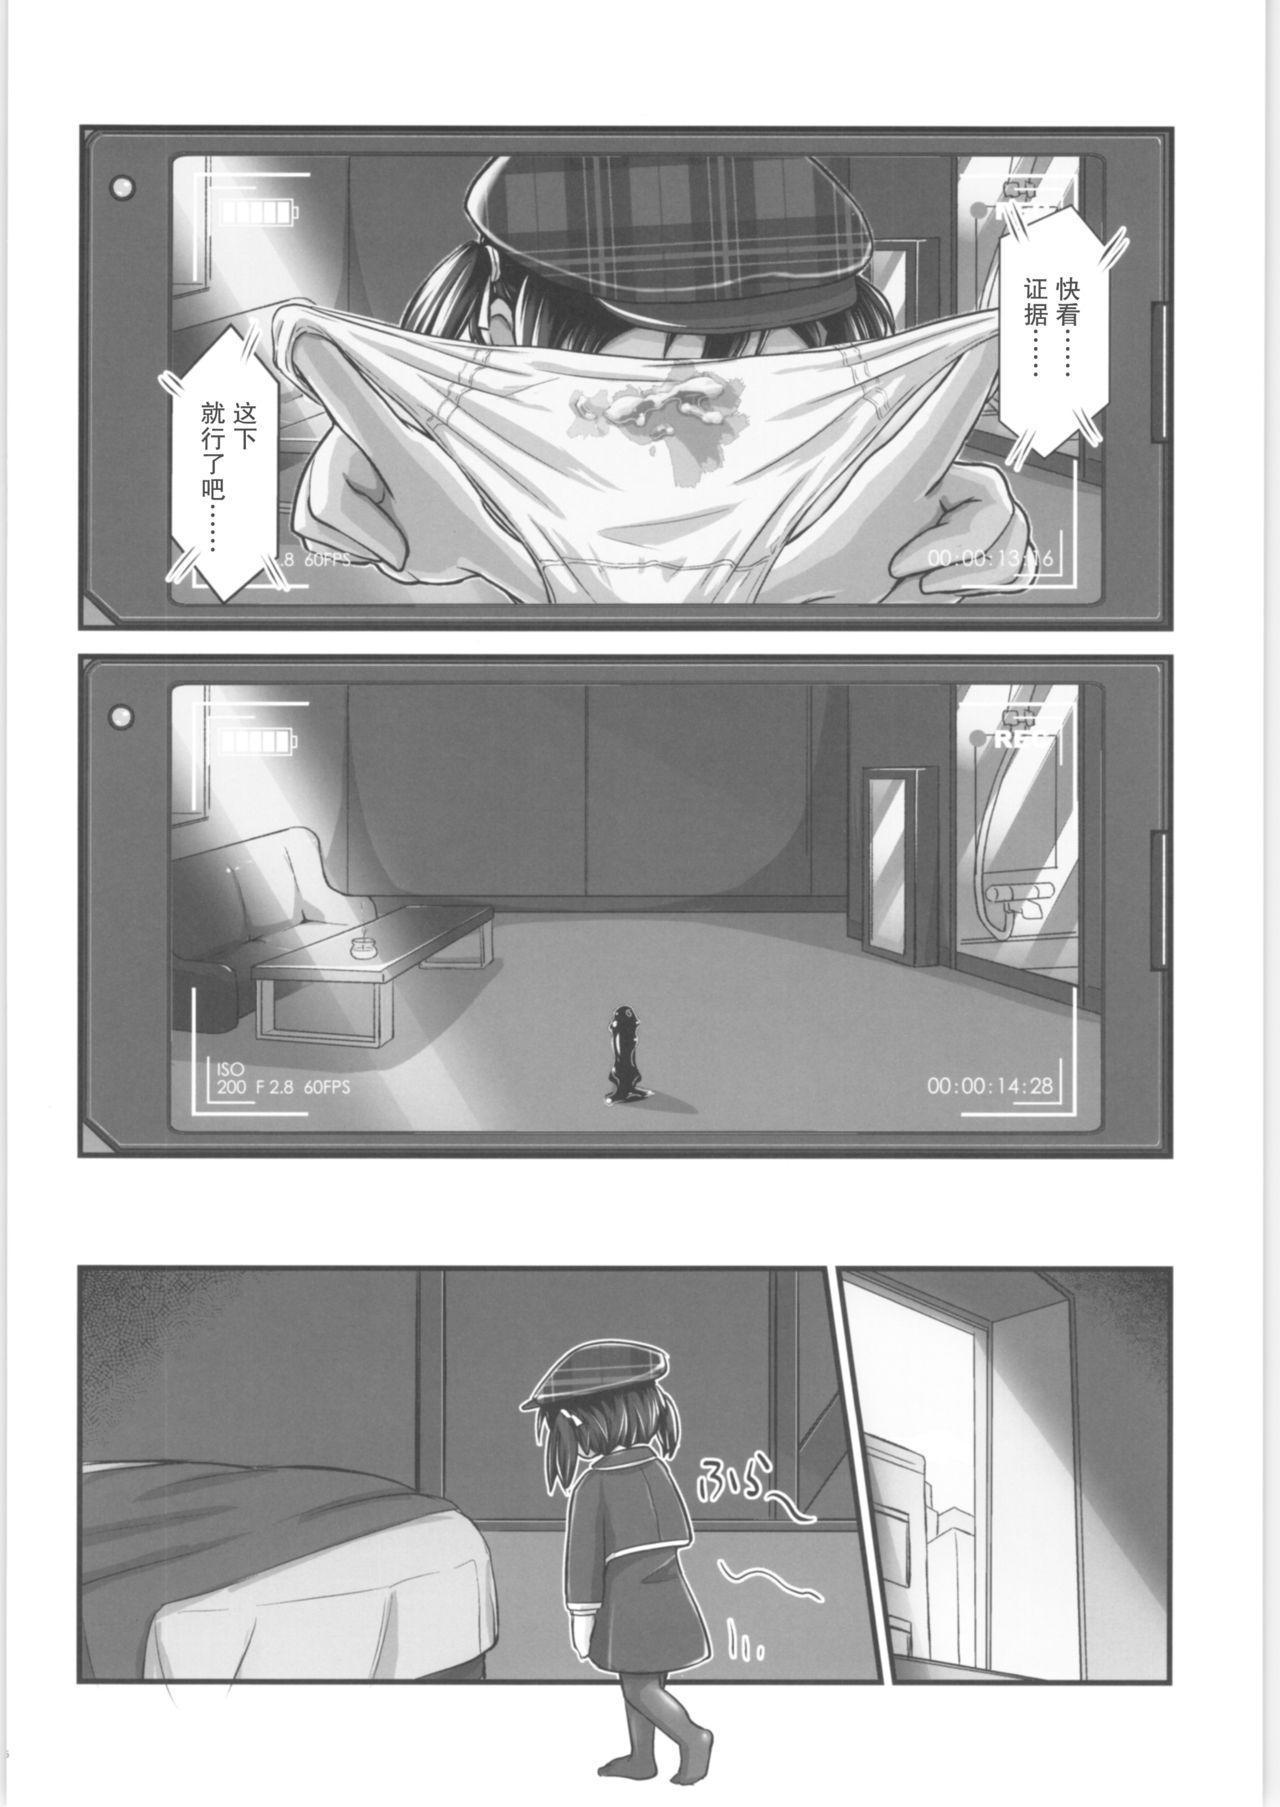 [Umari-ya (D-2)] Kiriko Route Another #05 ~Seifuku Josou Anal Junchi Hen~ (Sword Art Online) ) [Chinese] [不可视汉化] 15